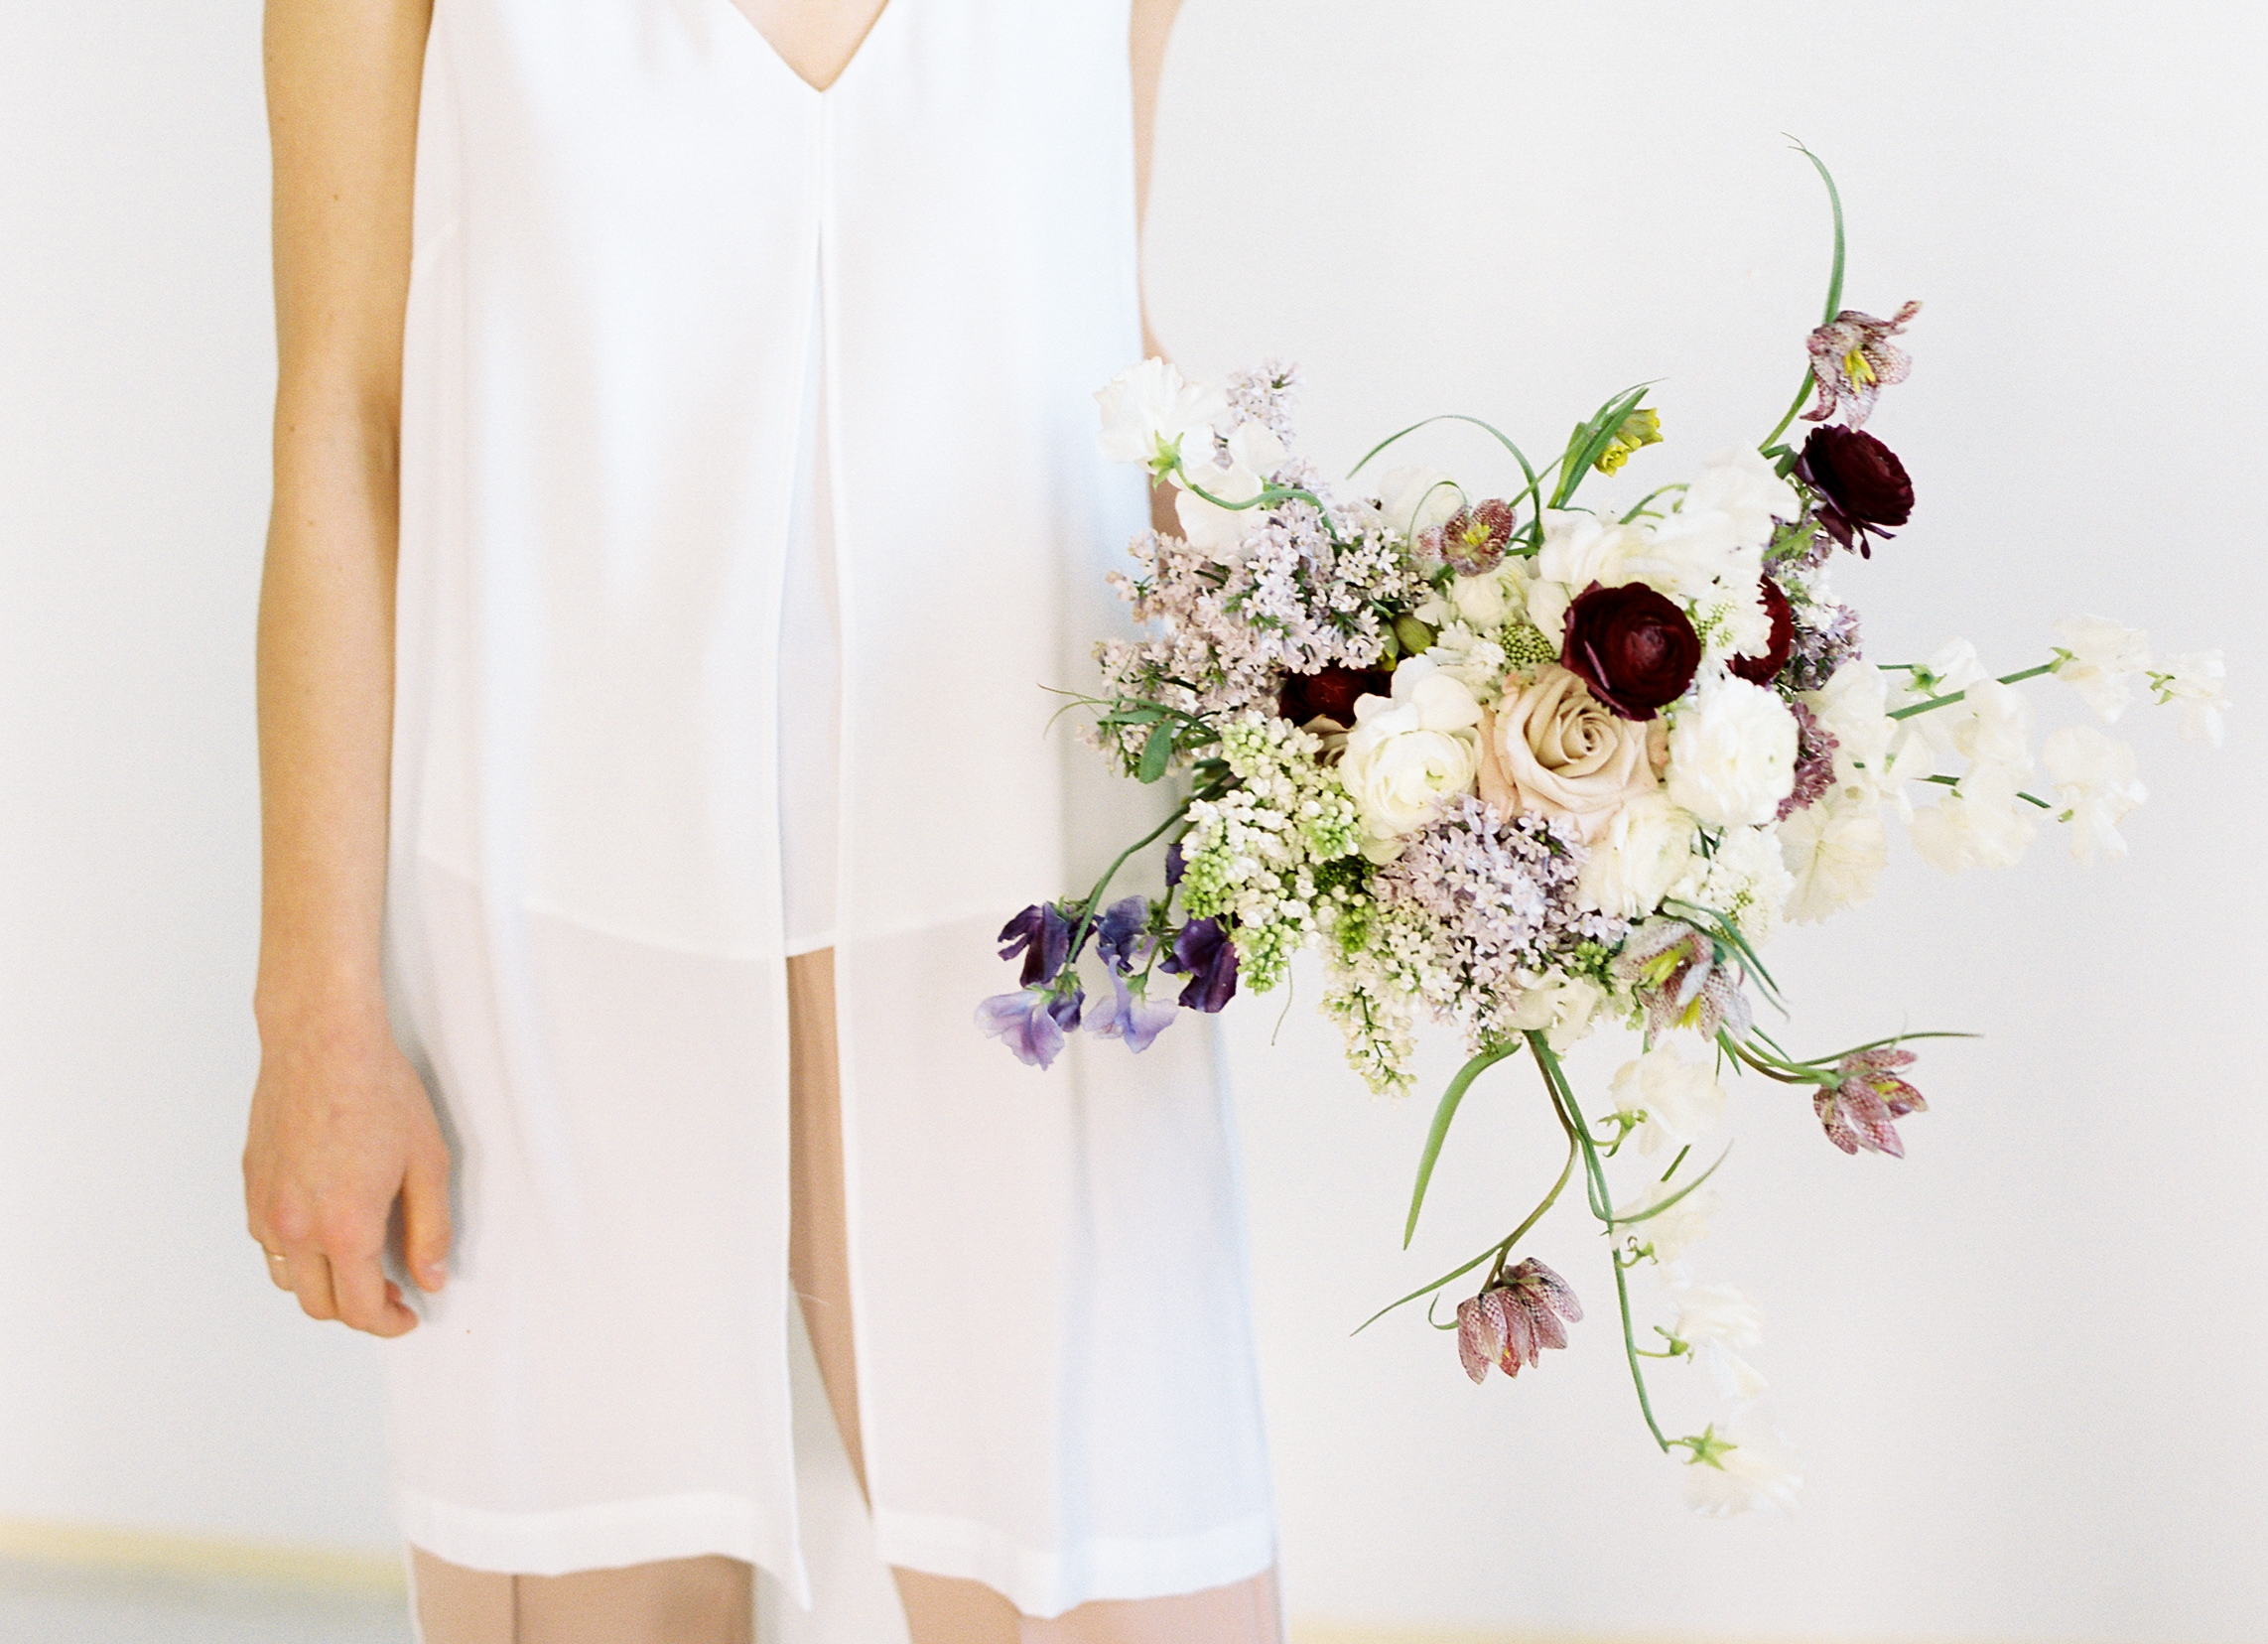 ranunculus spring bouquet wedding minneapolis st. paul minnesota fritillaria .jpg